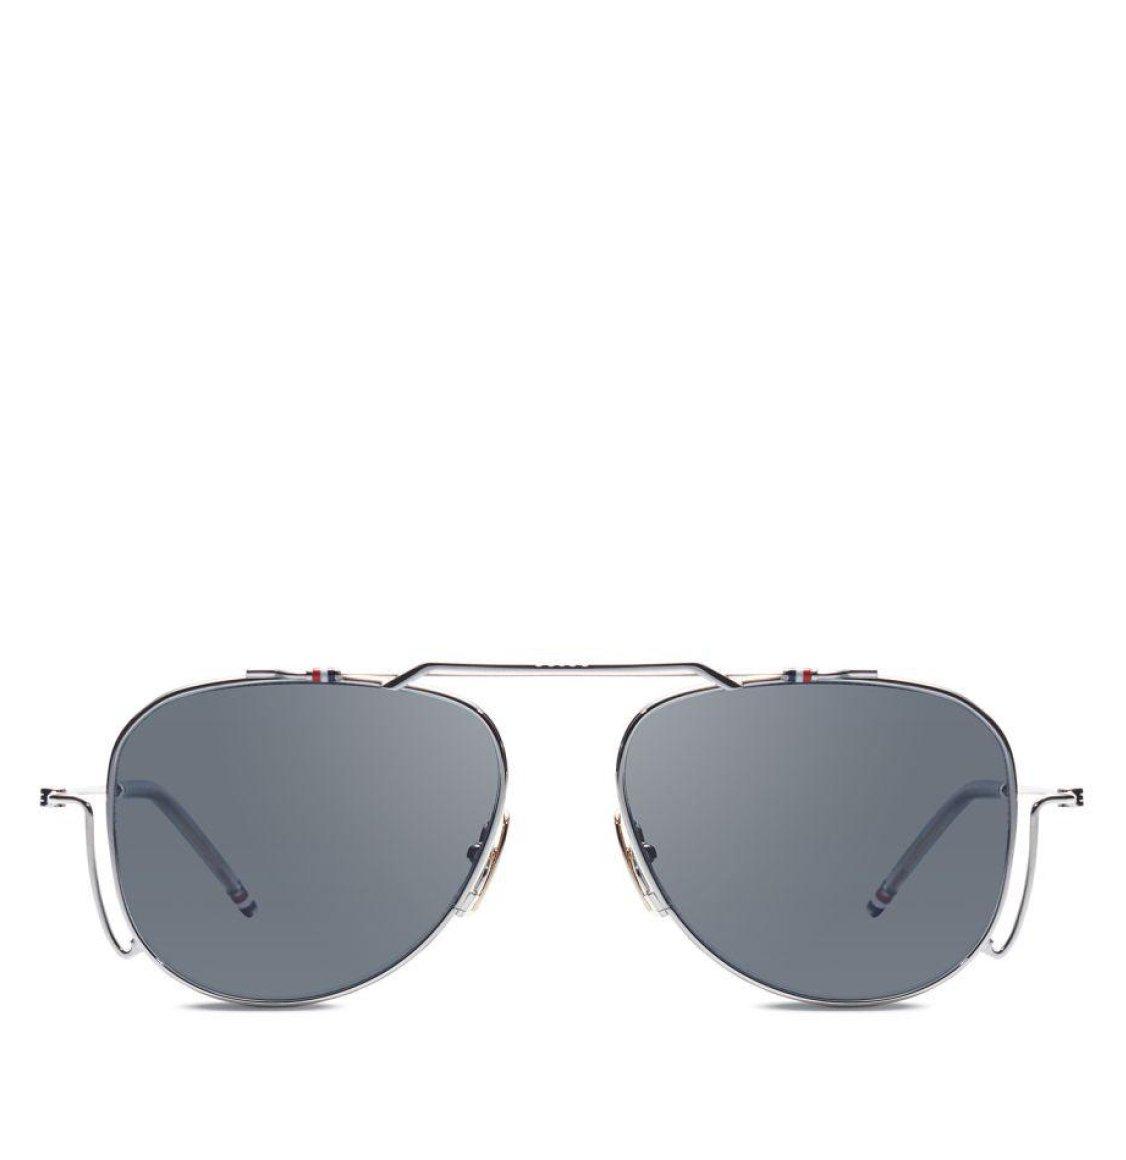 Thom Browne 56 Silver White Gold Aviator Sunglasses Γυαλιά Ηλίου